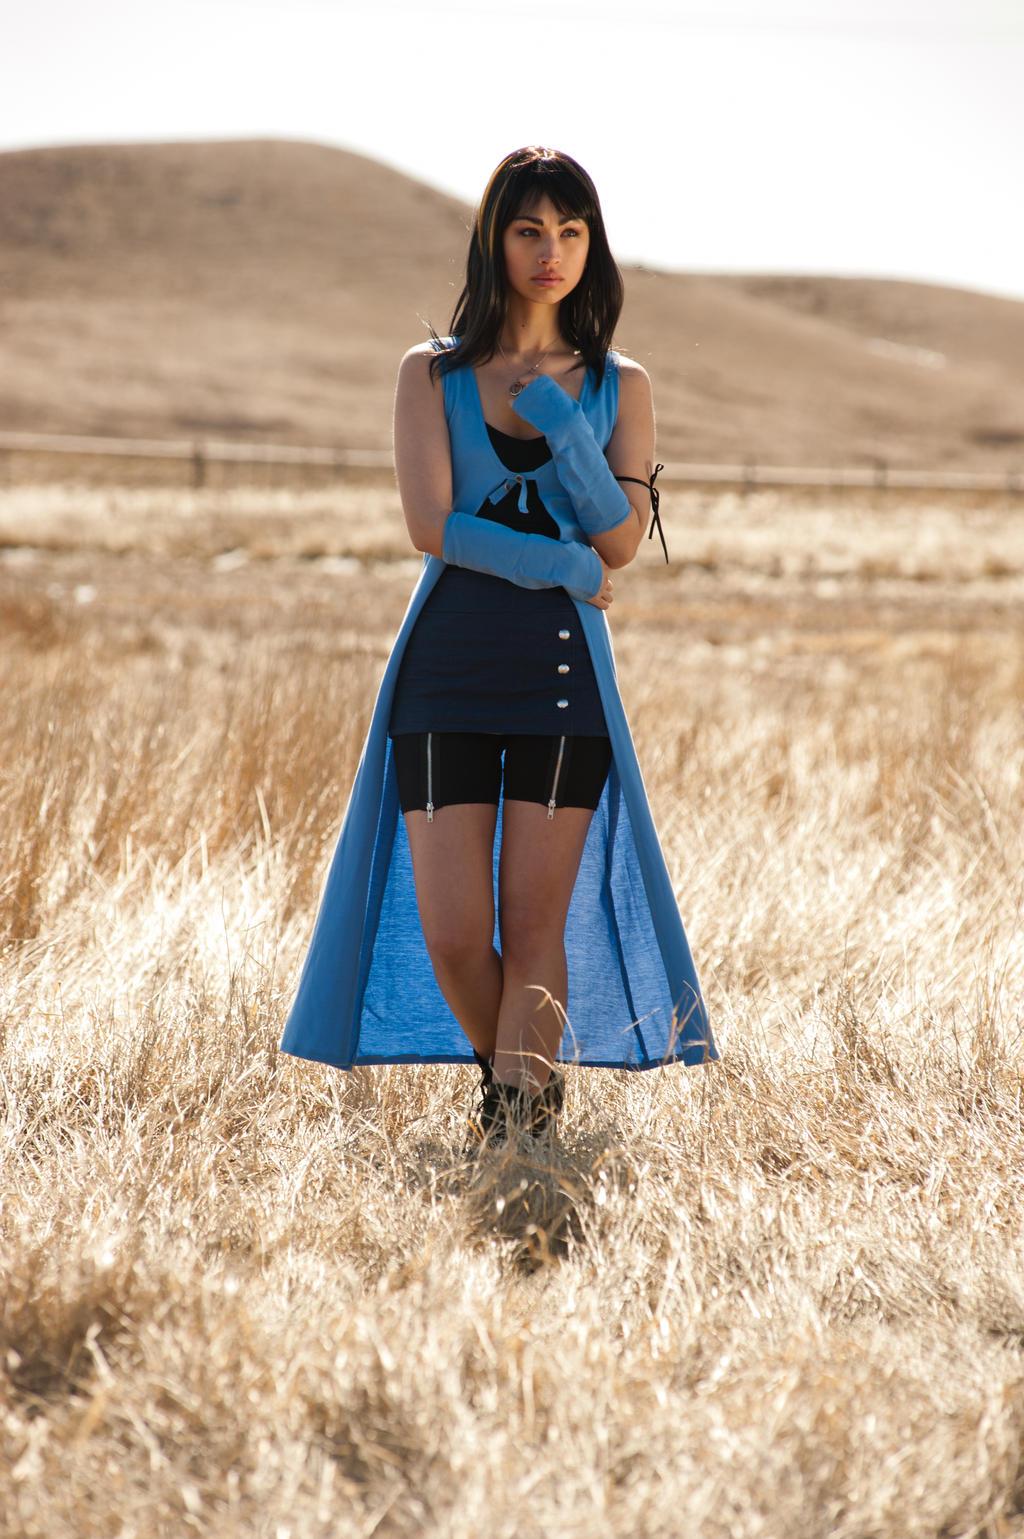 Vanessa Rinoa 3a by jagged-eye